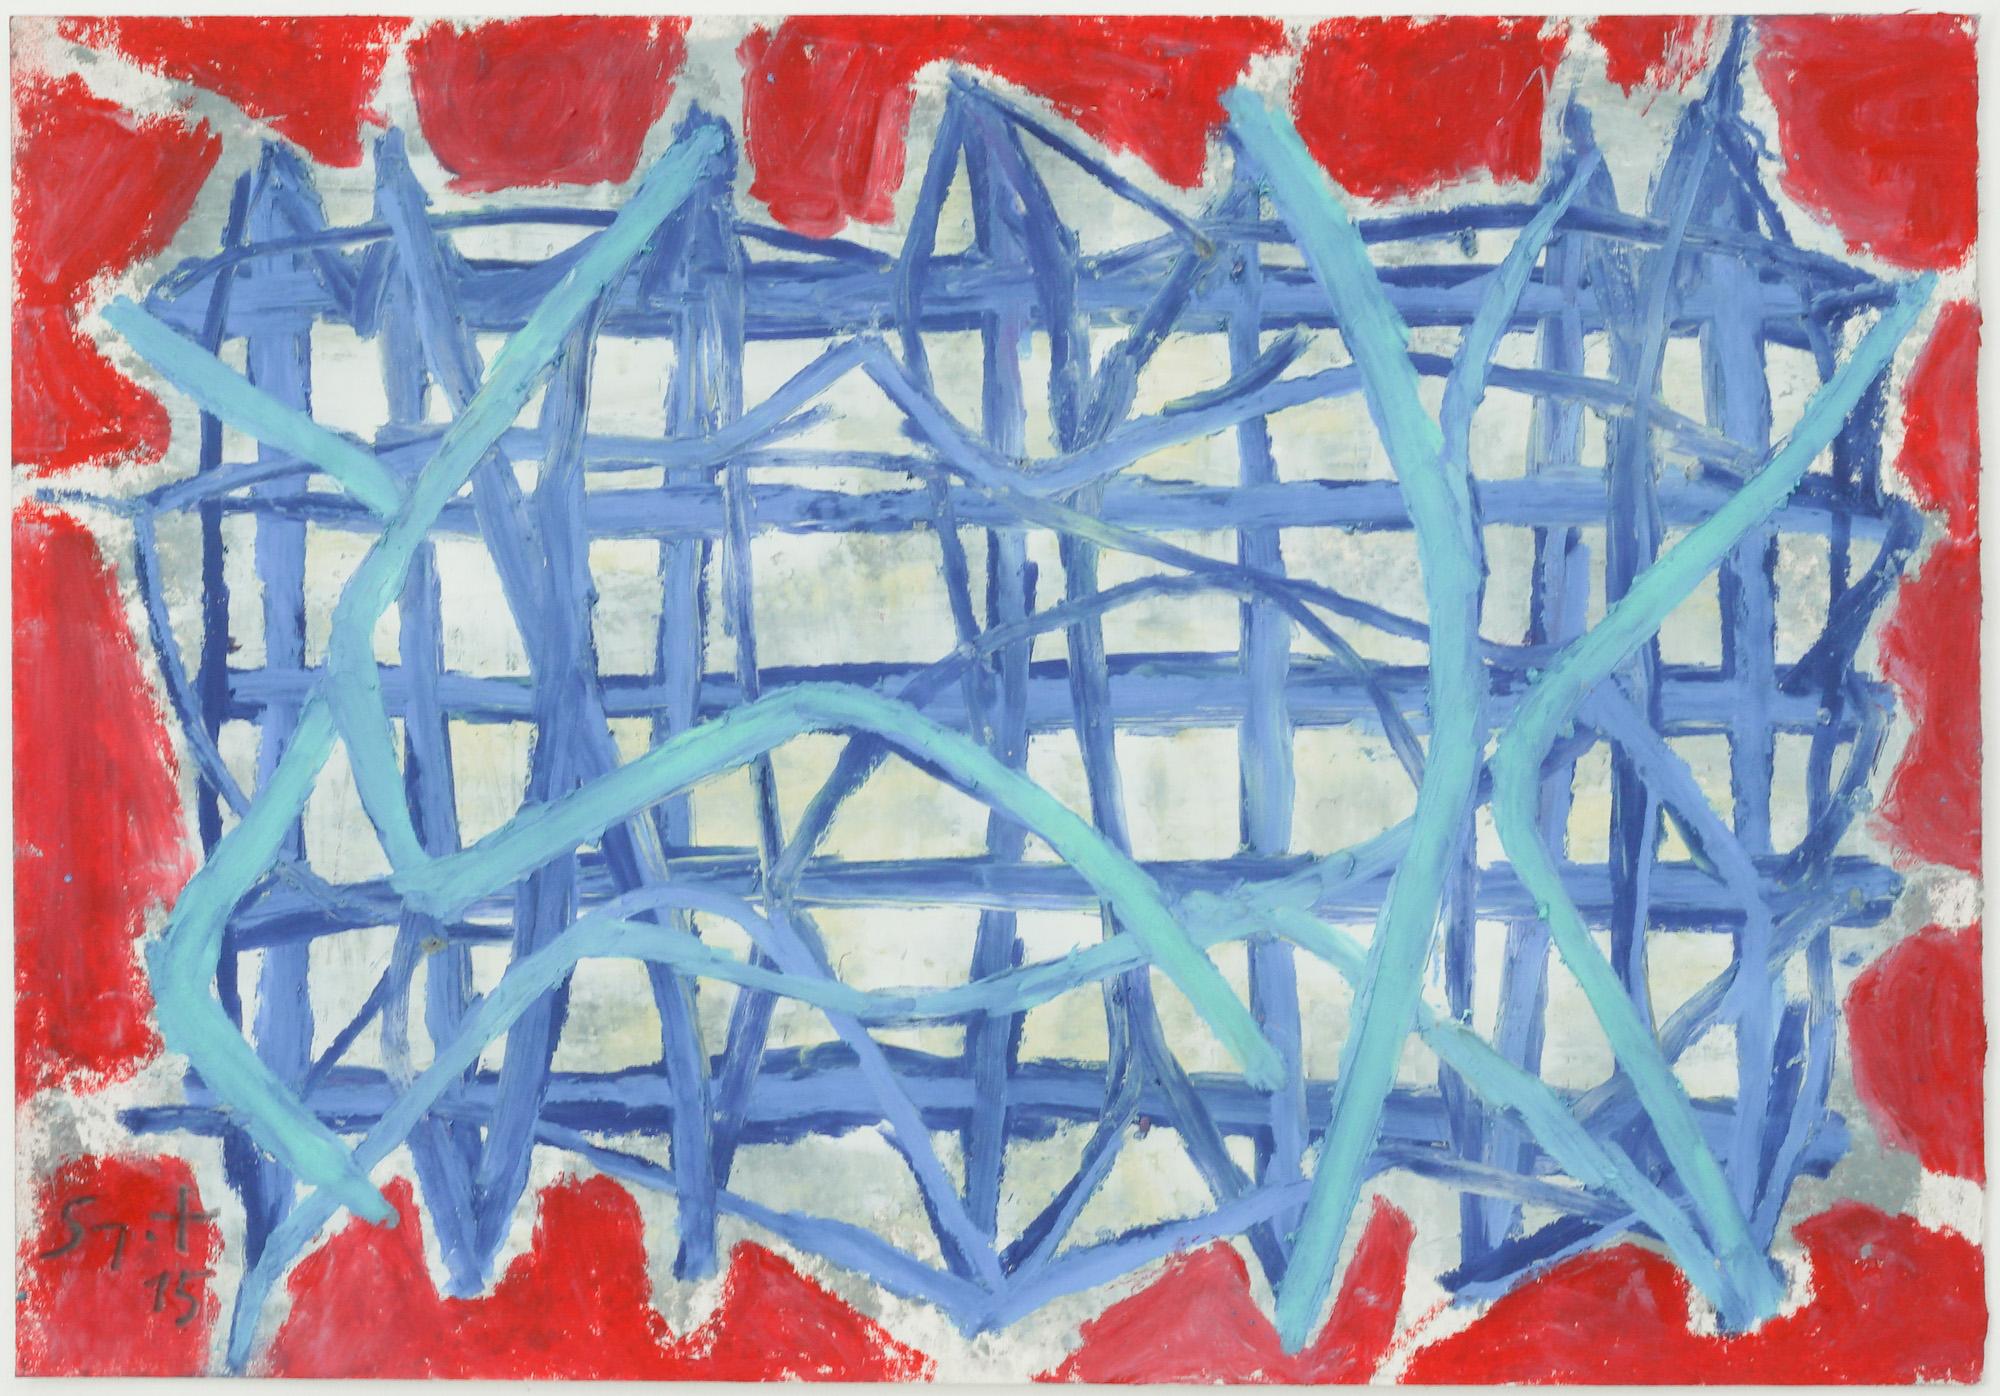 Somyot Hananuntasuk, 2015_22, 2015, Oil Pastel on Paper, 18 x 26 cm, Affinity Art.jpg